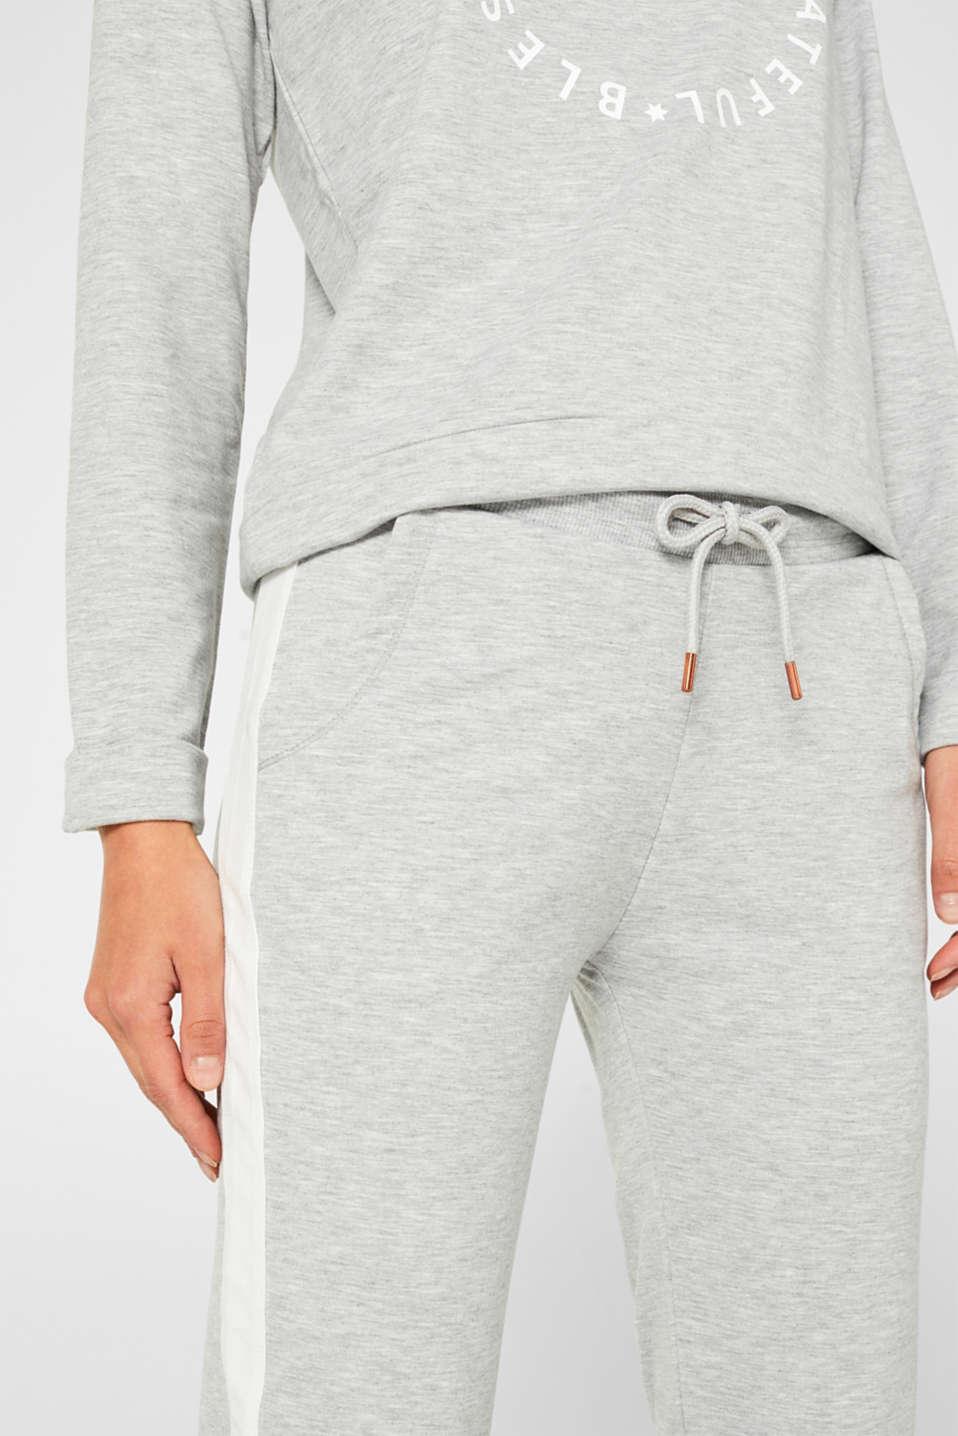 Nightpants, GREY, detail image number 1